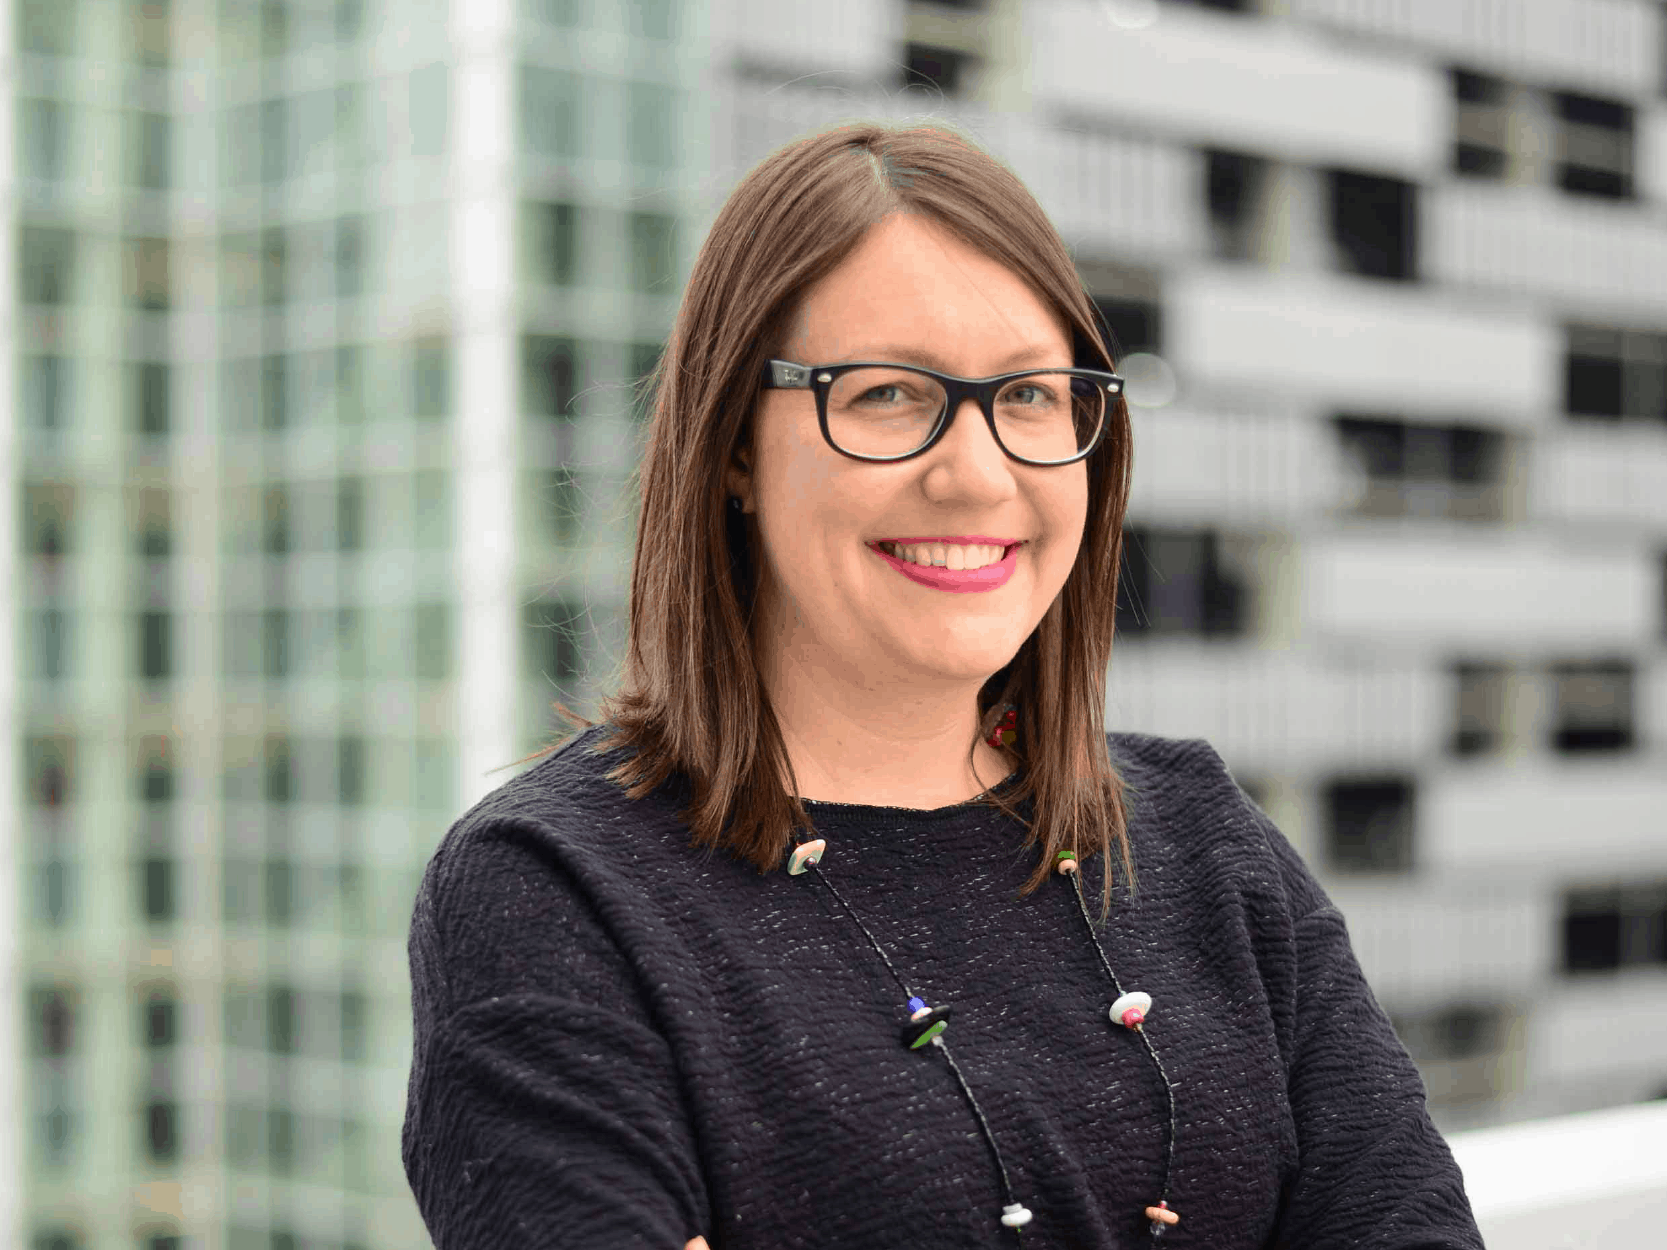 Amanda K. Moser